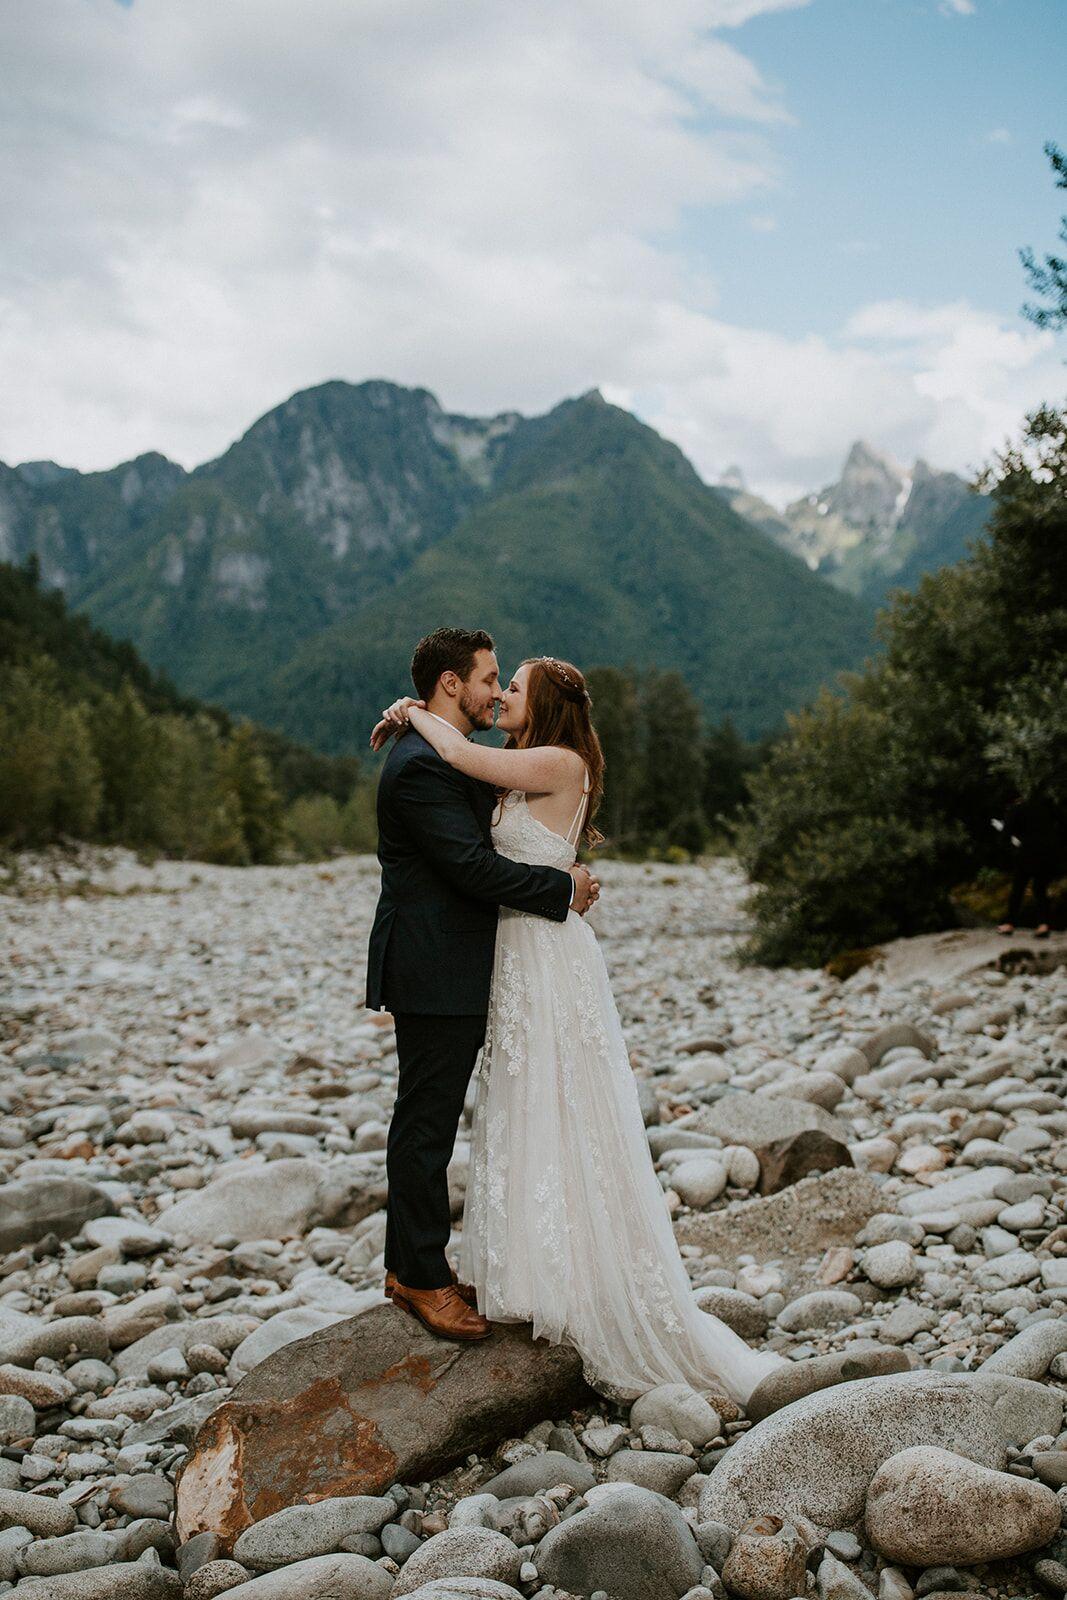 Blue-Sky-Ranch-Wedding-Block-Weddings-and-Events.jpeg